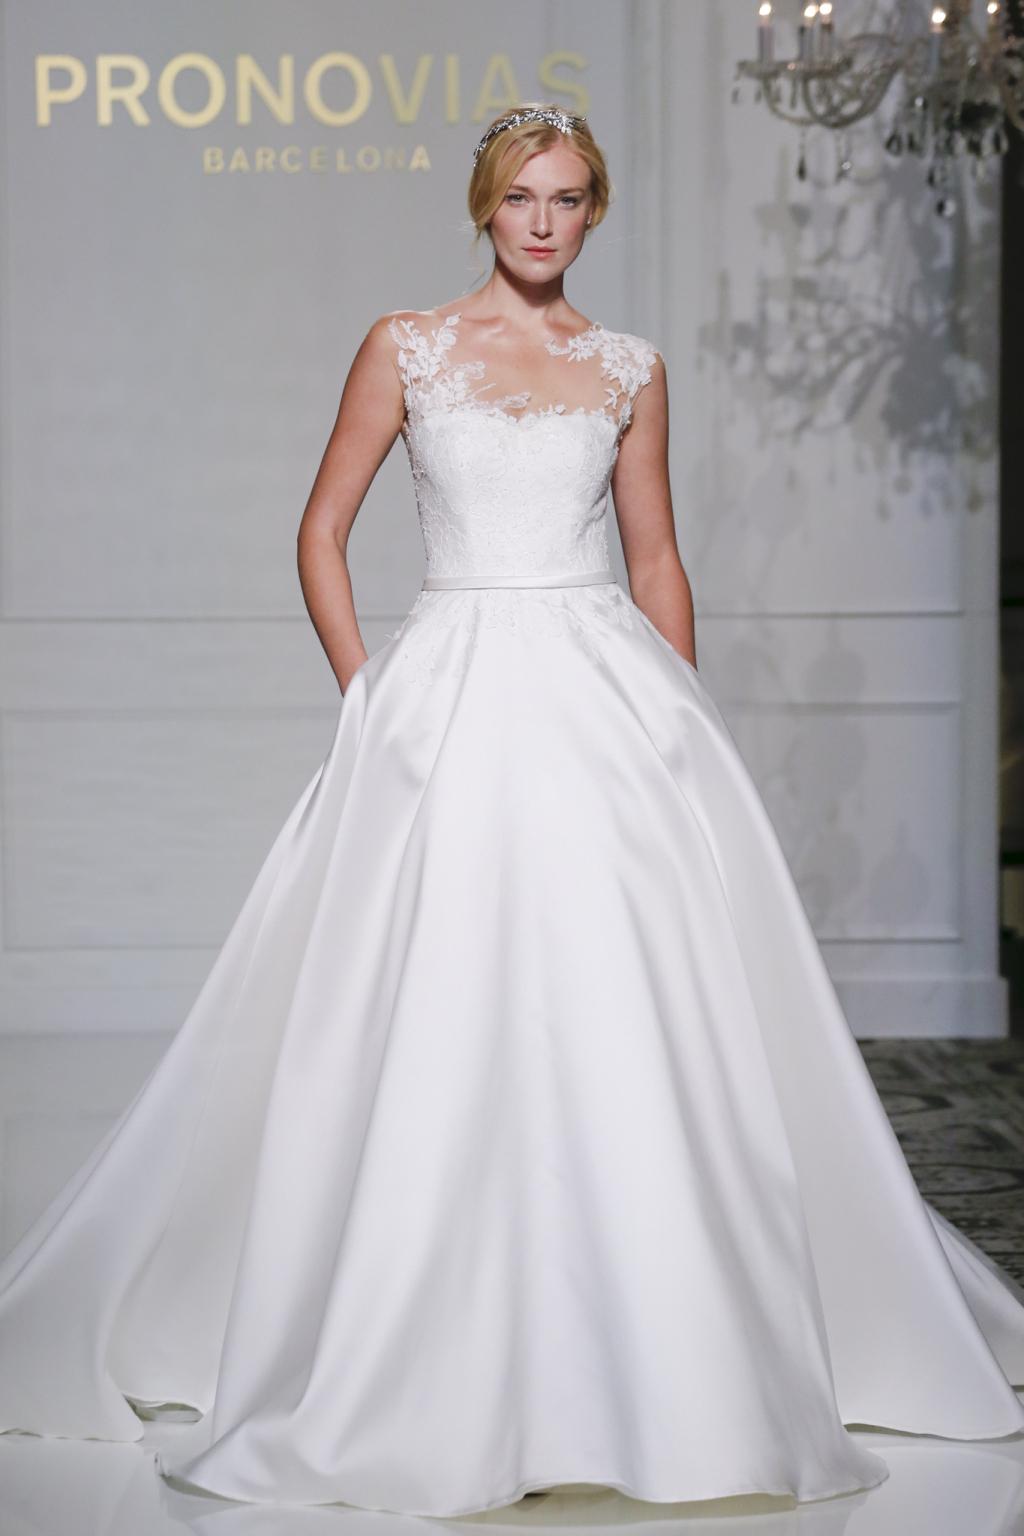 Pronovias Fall 2016 Wedding Dress Collection Arabia Weddings